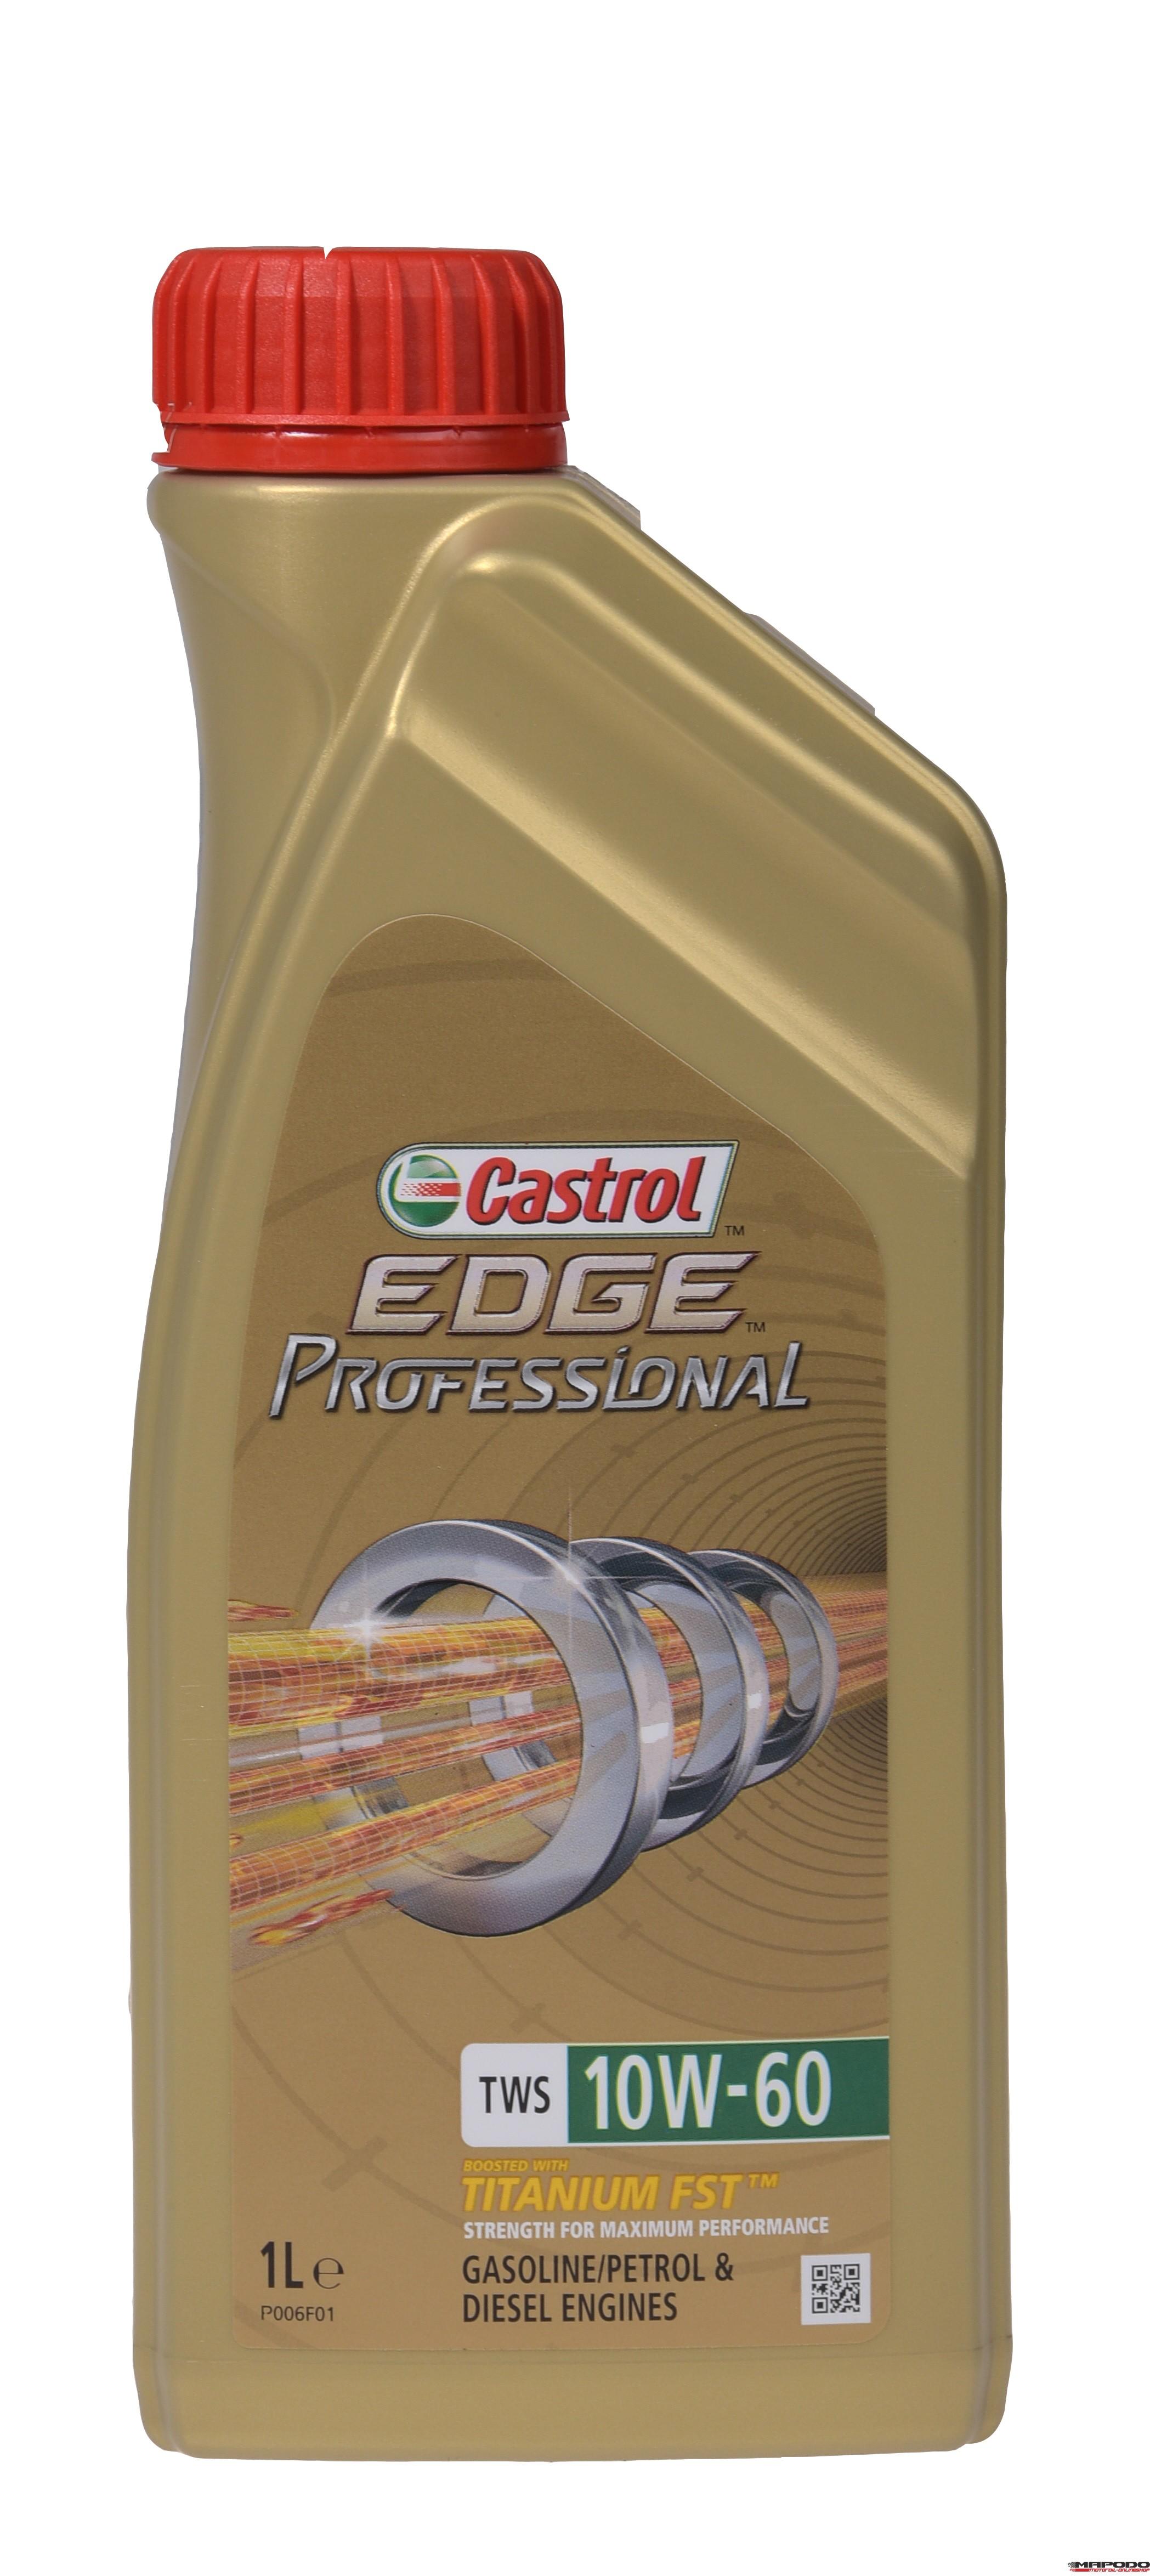 Castrol Edge Professional TWS 10W-60